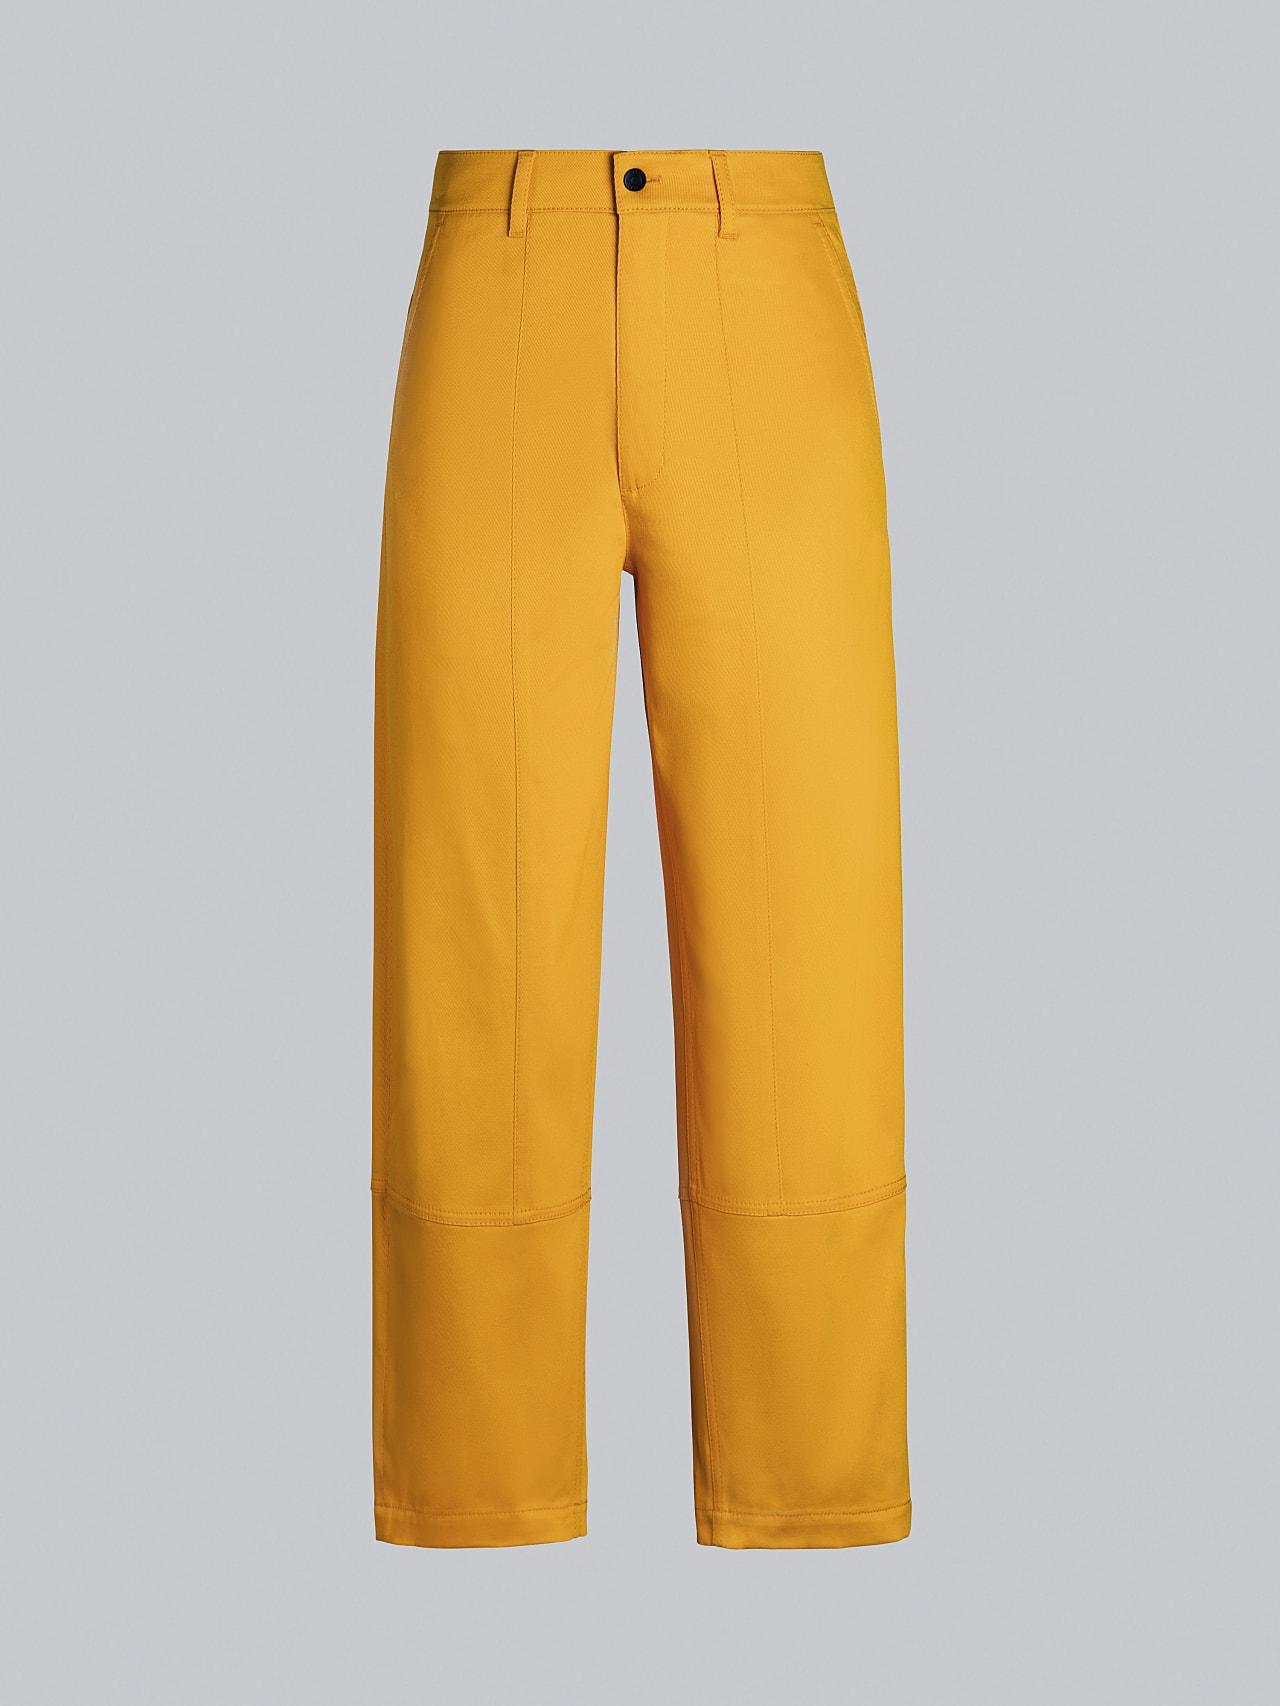 PCHAR V1.Y5.02 Tapered Barrel-Leg Pants yellow Back Alpha Tauri